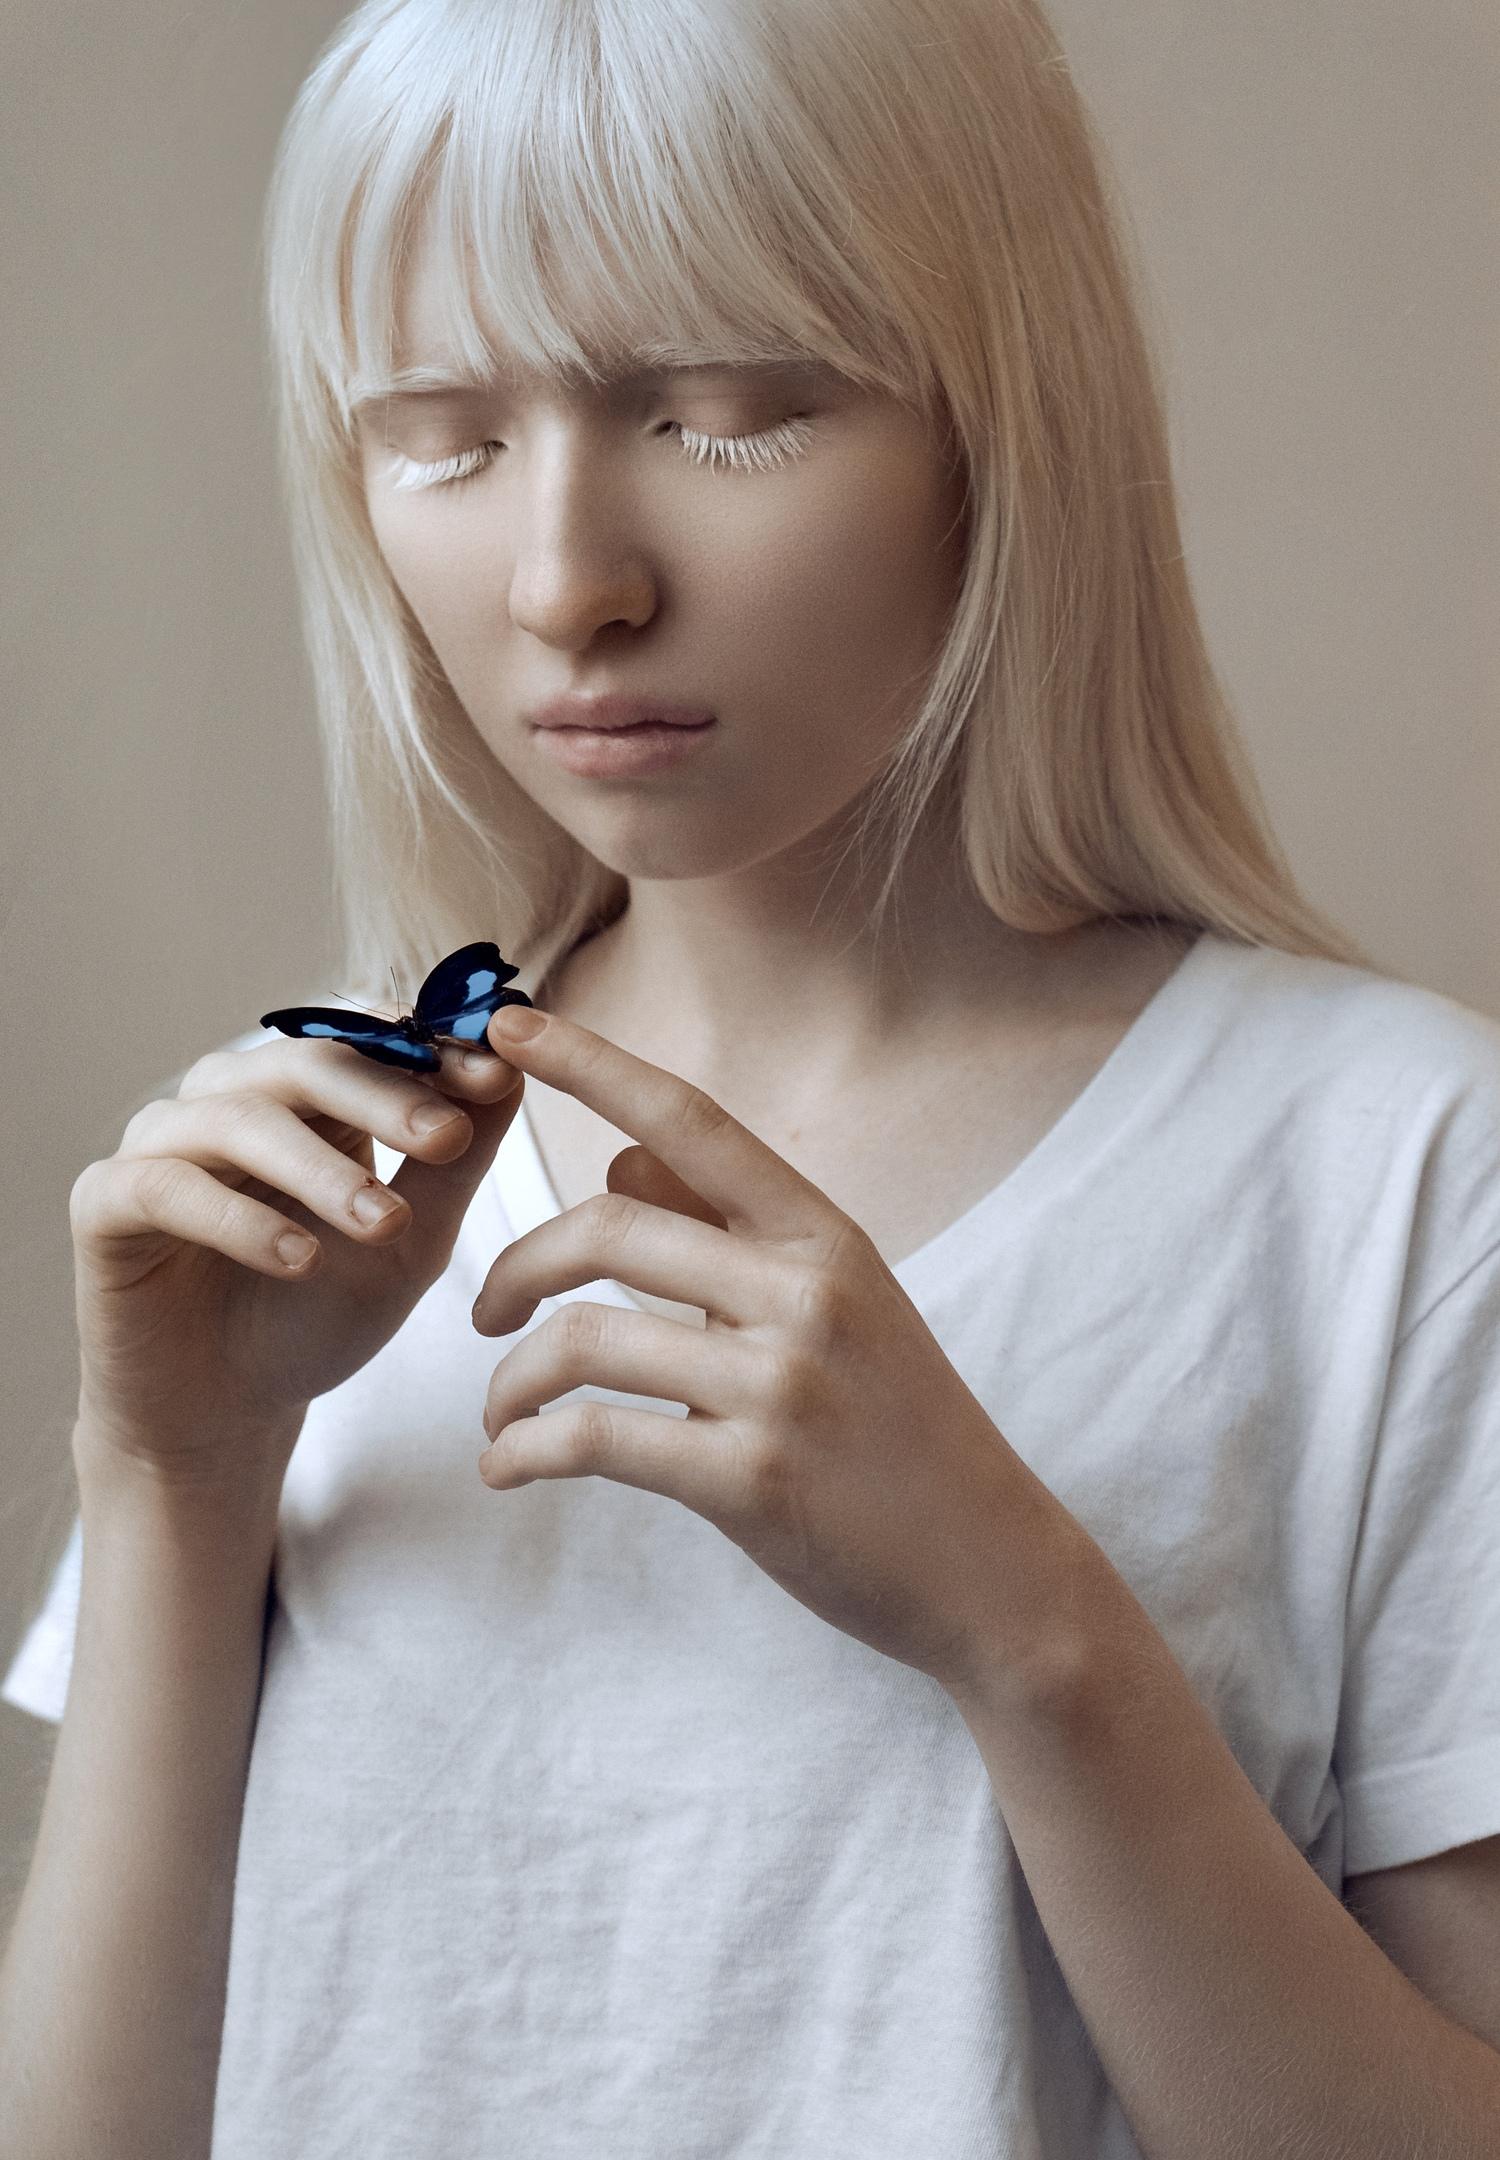 https://www.youngfolks.ru/pub/photograph-natasha-yankelevich-model-nastya-zhidkova